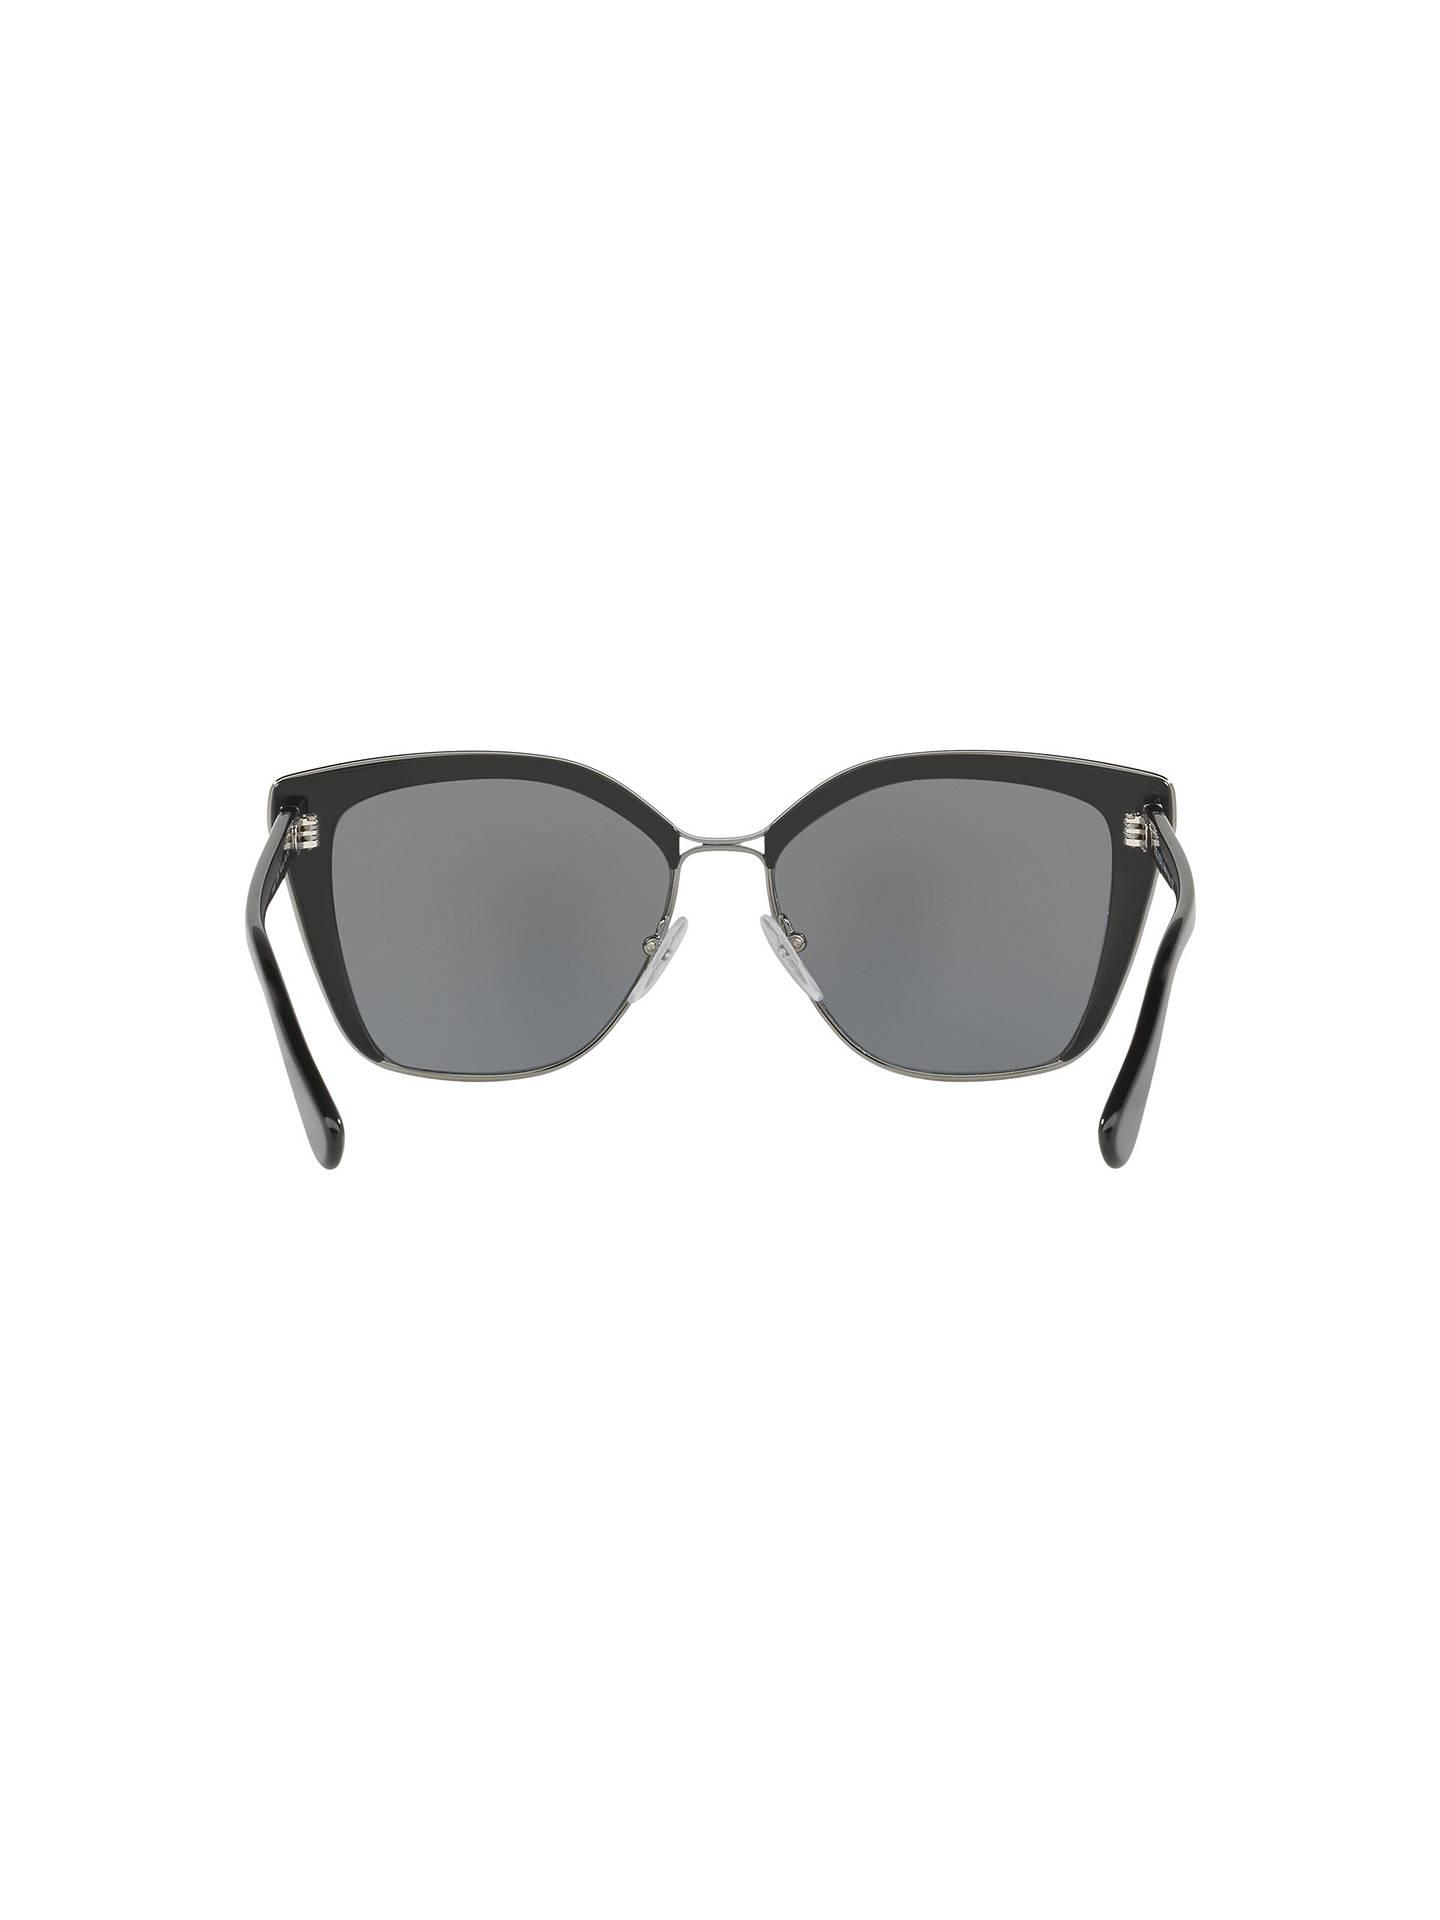 2089ca113cb Buy Prada PR 56TS Square Sunglasses